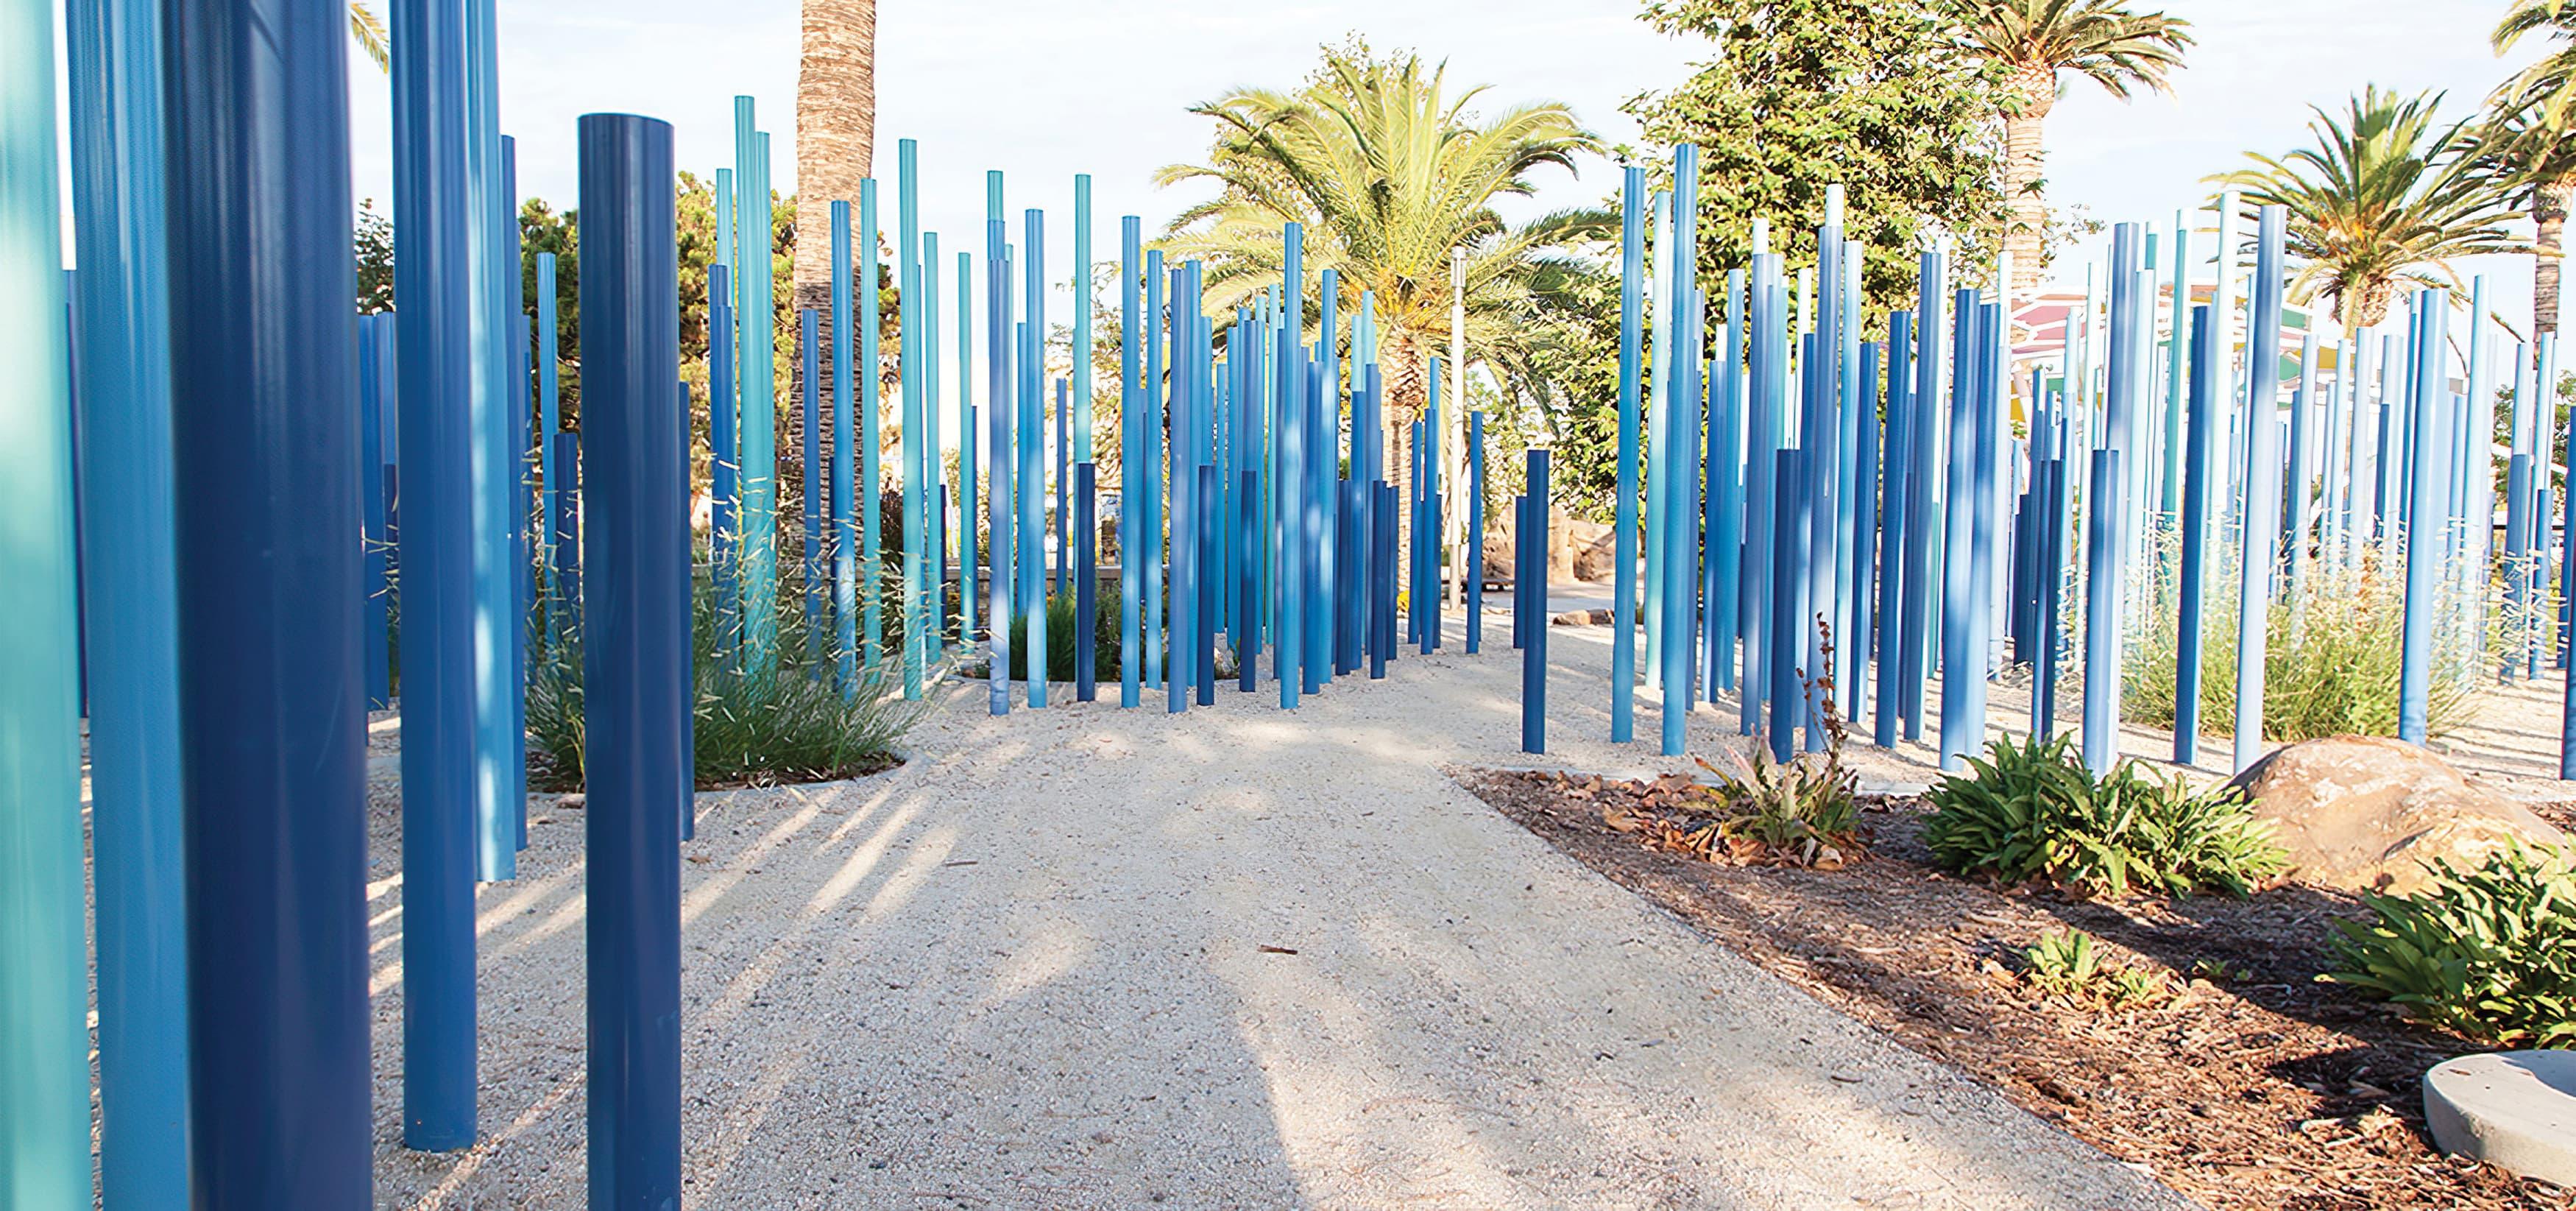 The Pools, a residential community park in Irvine, California. RSM Design prepared identity signage and regulatory signage. Sculptural Design. Park Design.